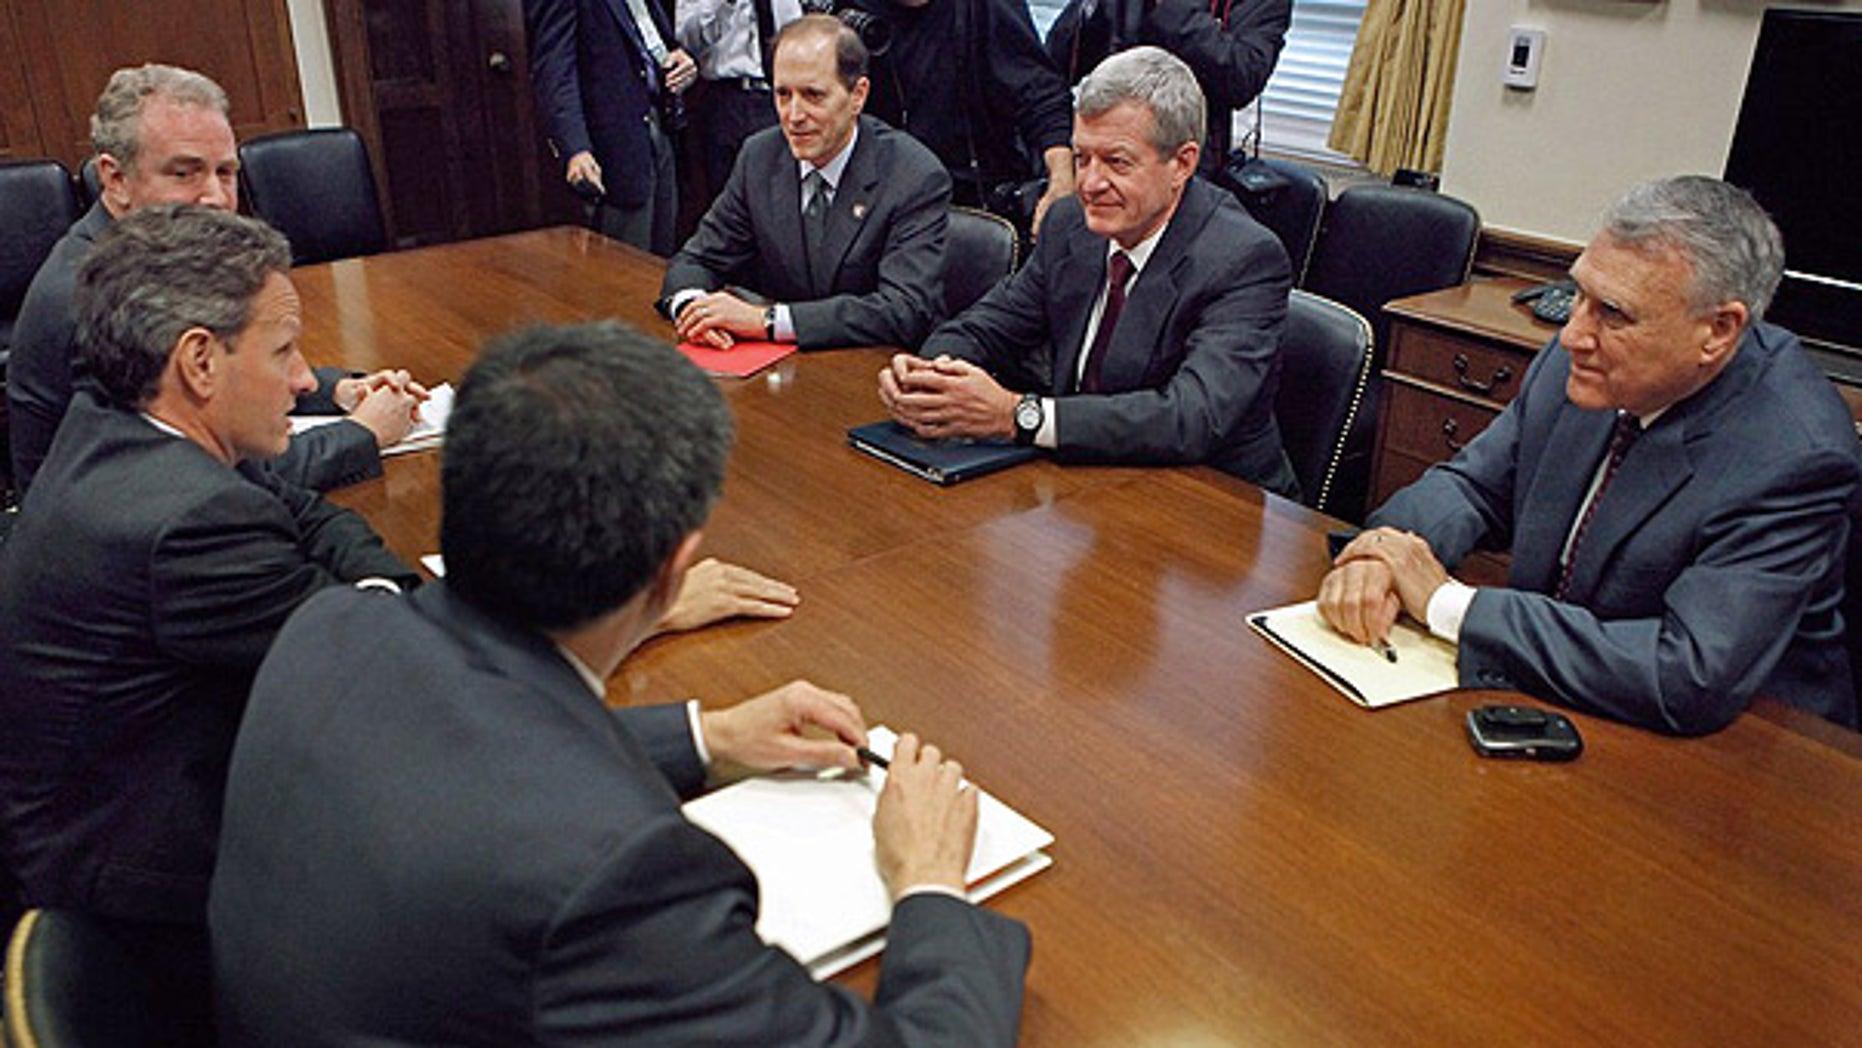 Dec. 1: Treasury Secretary Timothy Geithner, OMB Director Jacob Lew, Rep. Dave Camp (R-MI), Senate Finance Committee Chairman Max Baucus (D-MT) and Sen. Jon Kyl (R-AZ) meet to discuss extending Bush-era tax cuts in Washington.